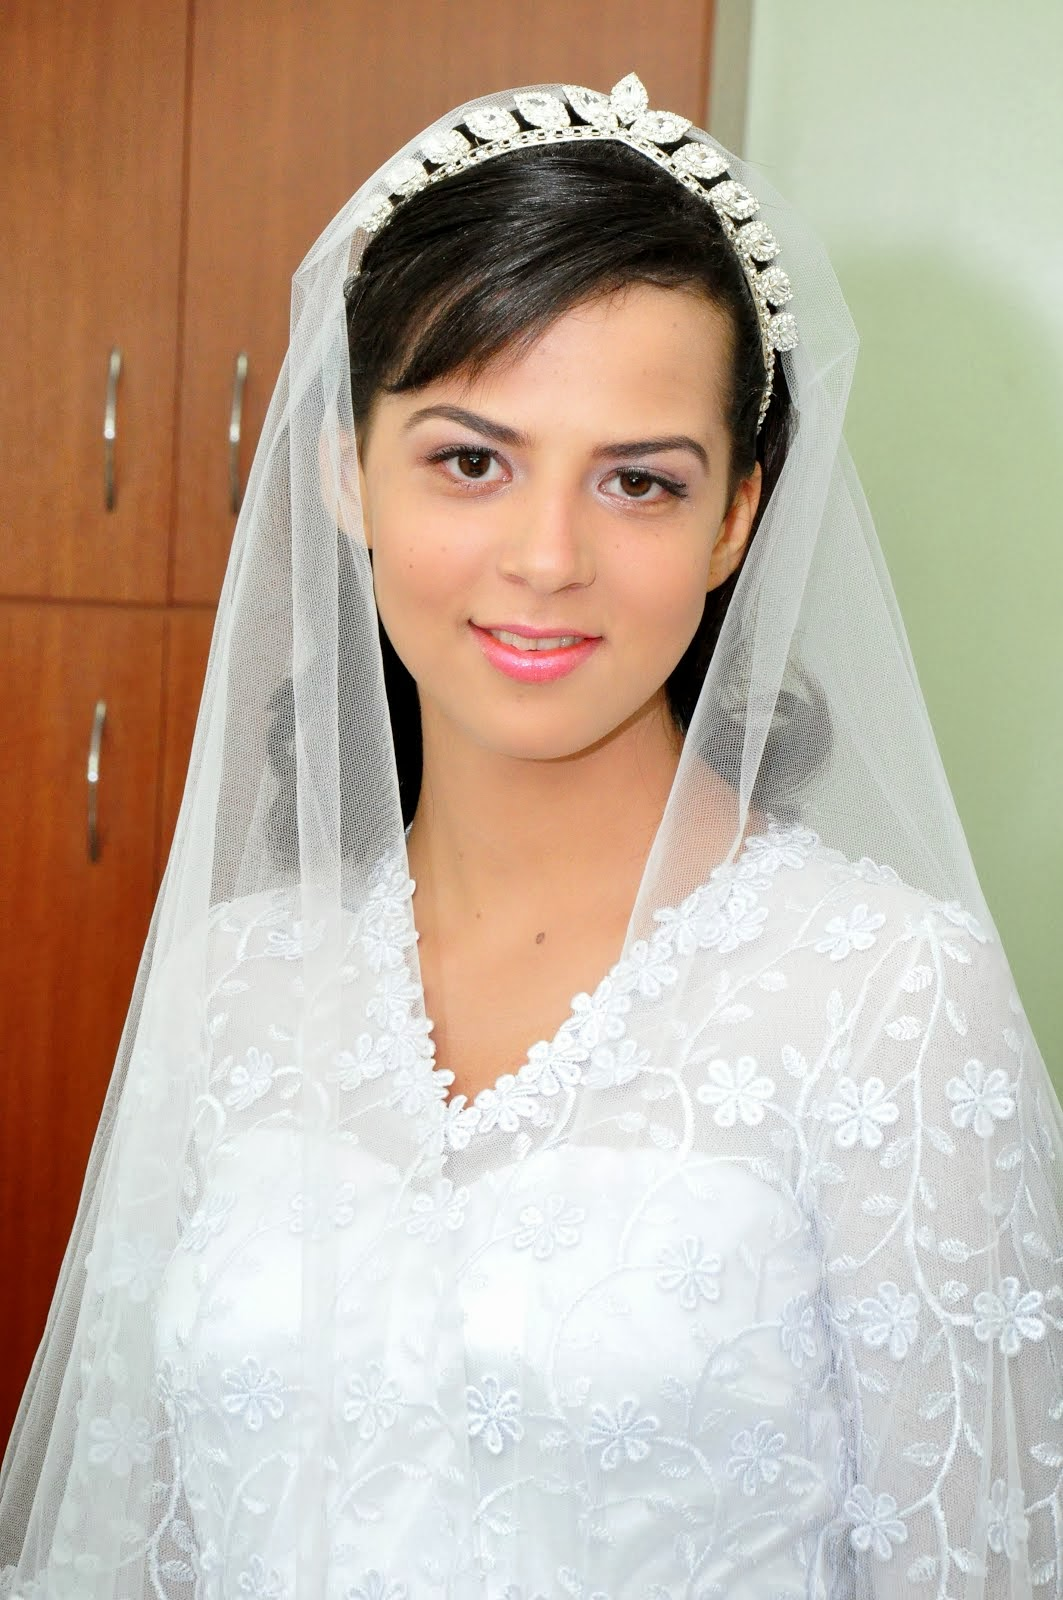 Enlace Matrimonial em Bonito/MS